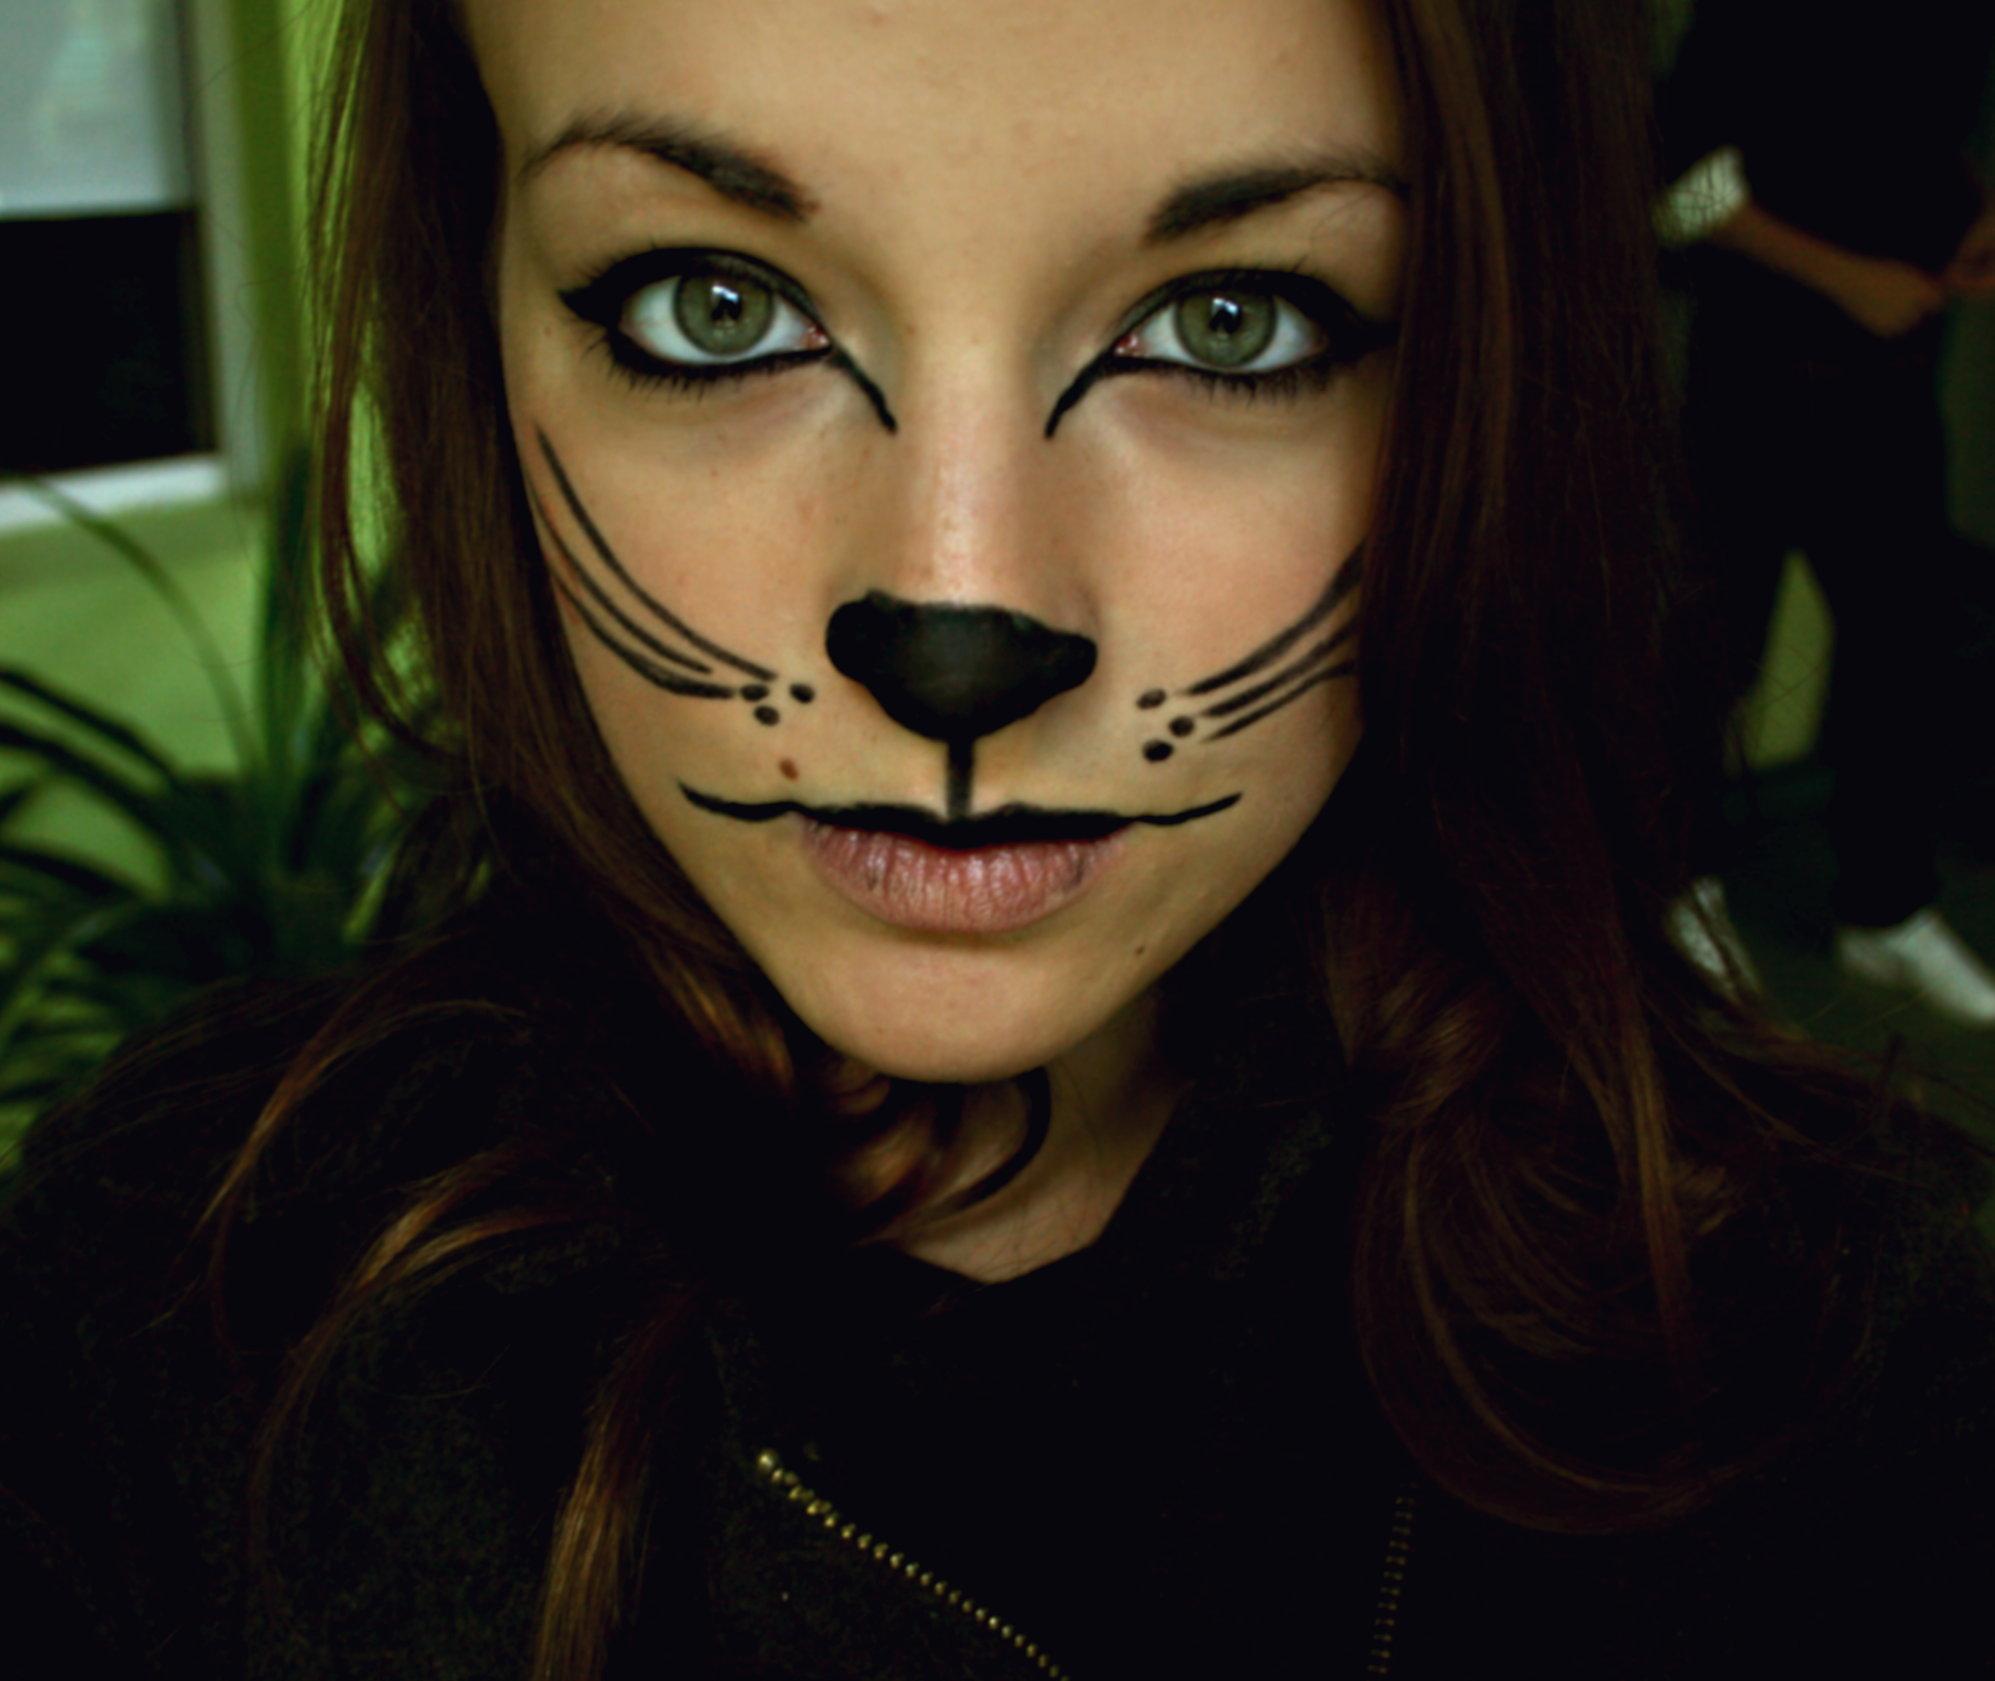 Макияж на хэллоуин для девушек фото кошка